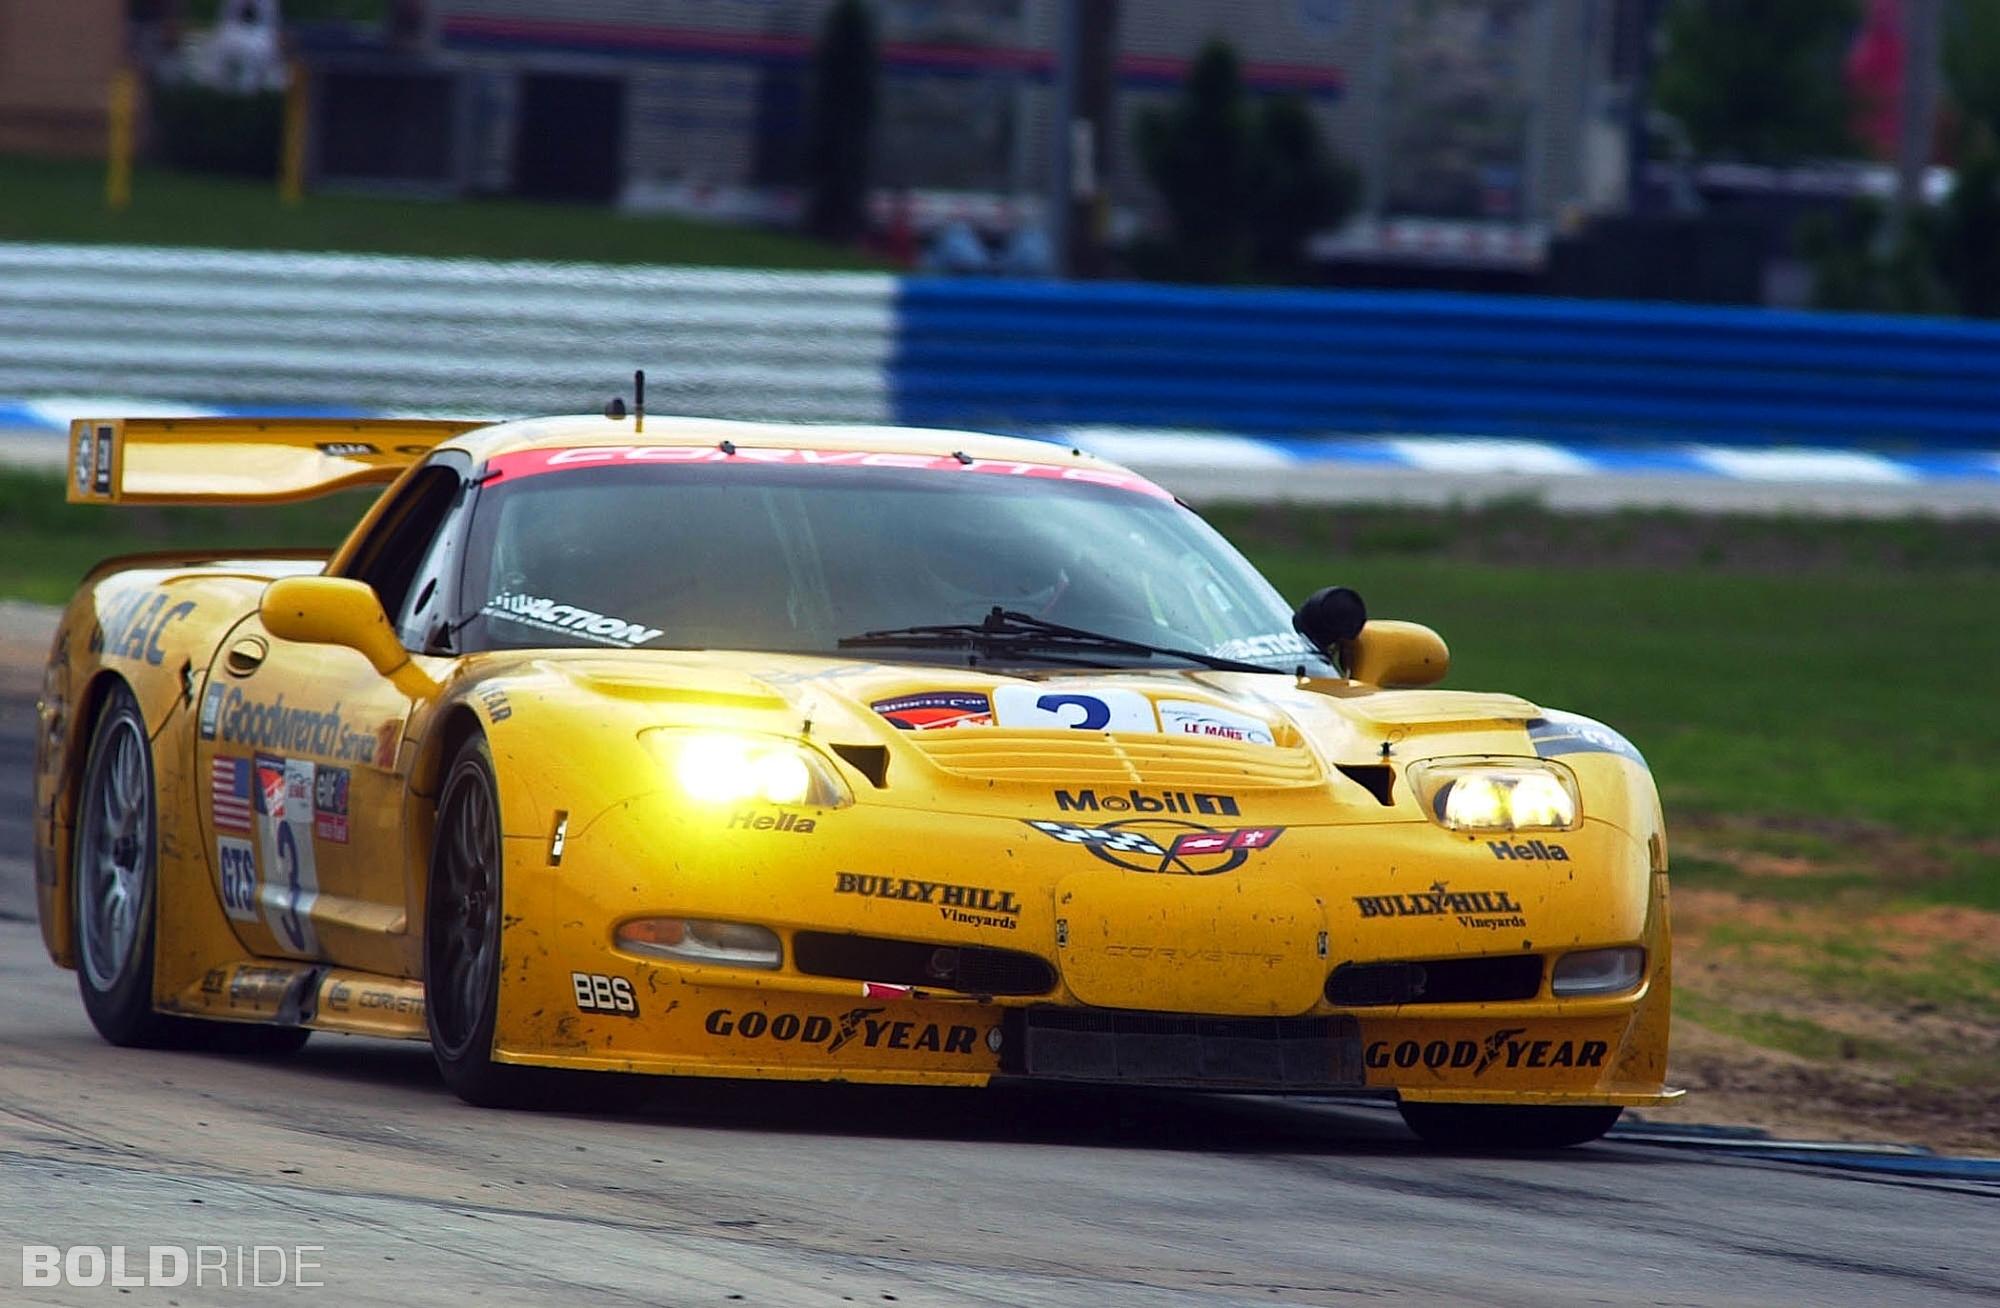 Corvette C5 R supercar supercars race racing o wallpaper background 2000x1308